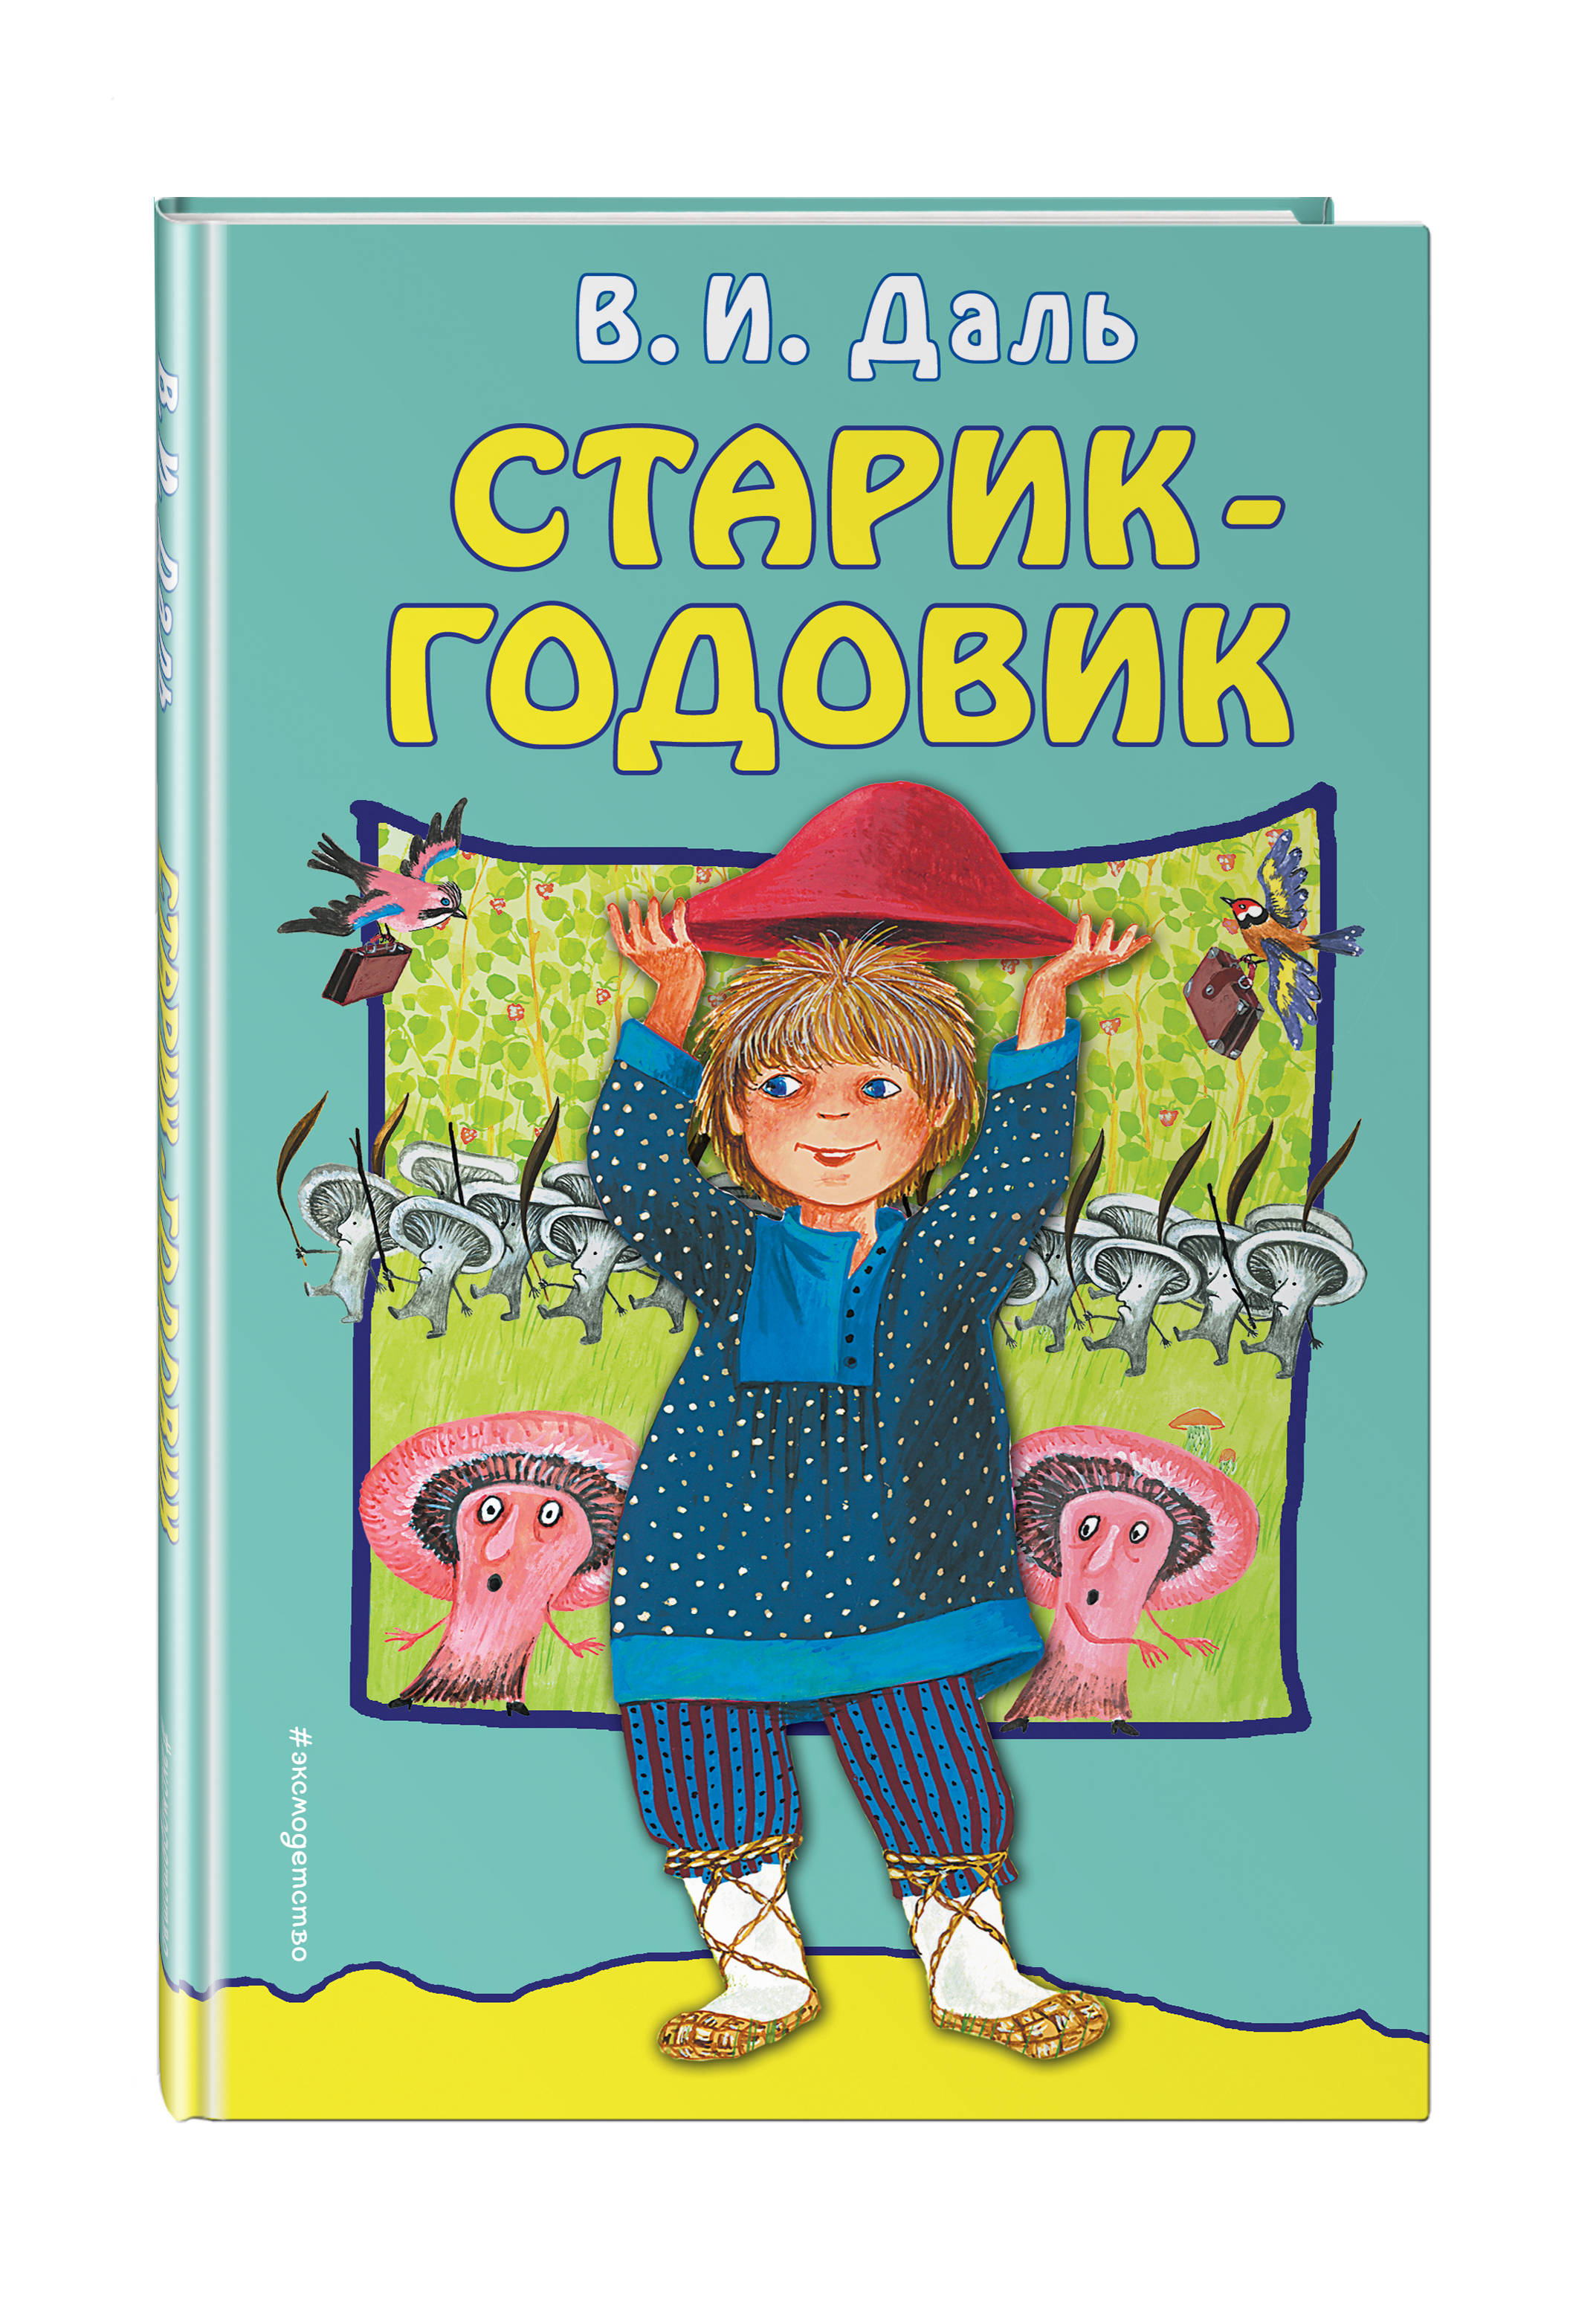 В. И. Даль Старик-годовик clever книга баканова екатерина старик годовик с 5 лет